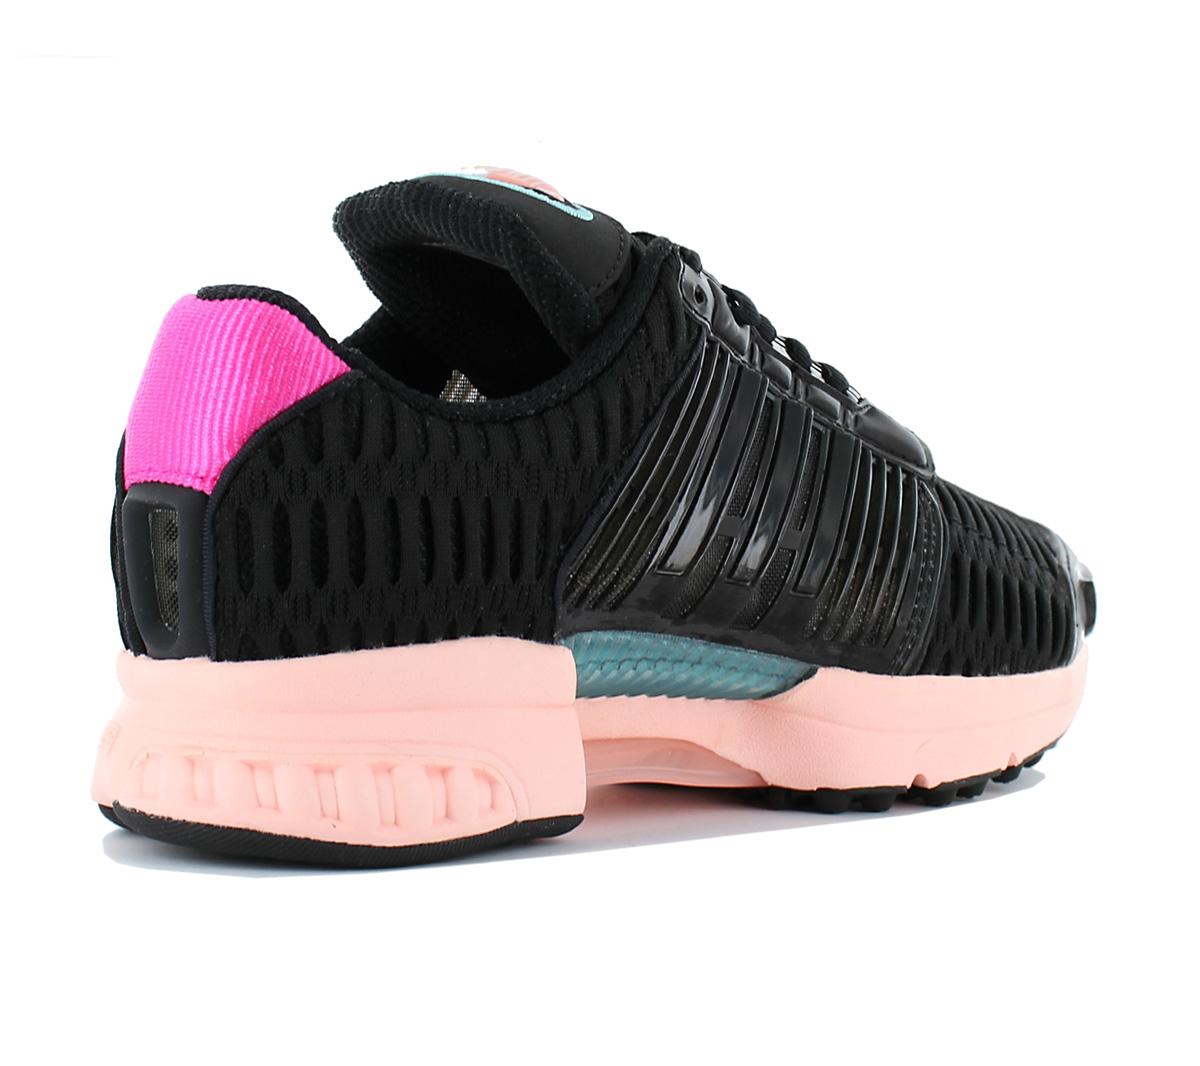 Damen W 1 Climacool adidas NEU Schuhe SALE BB5303 Schwarz